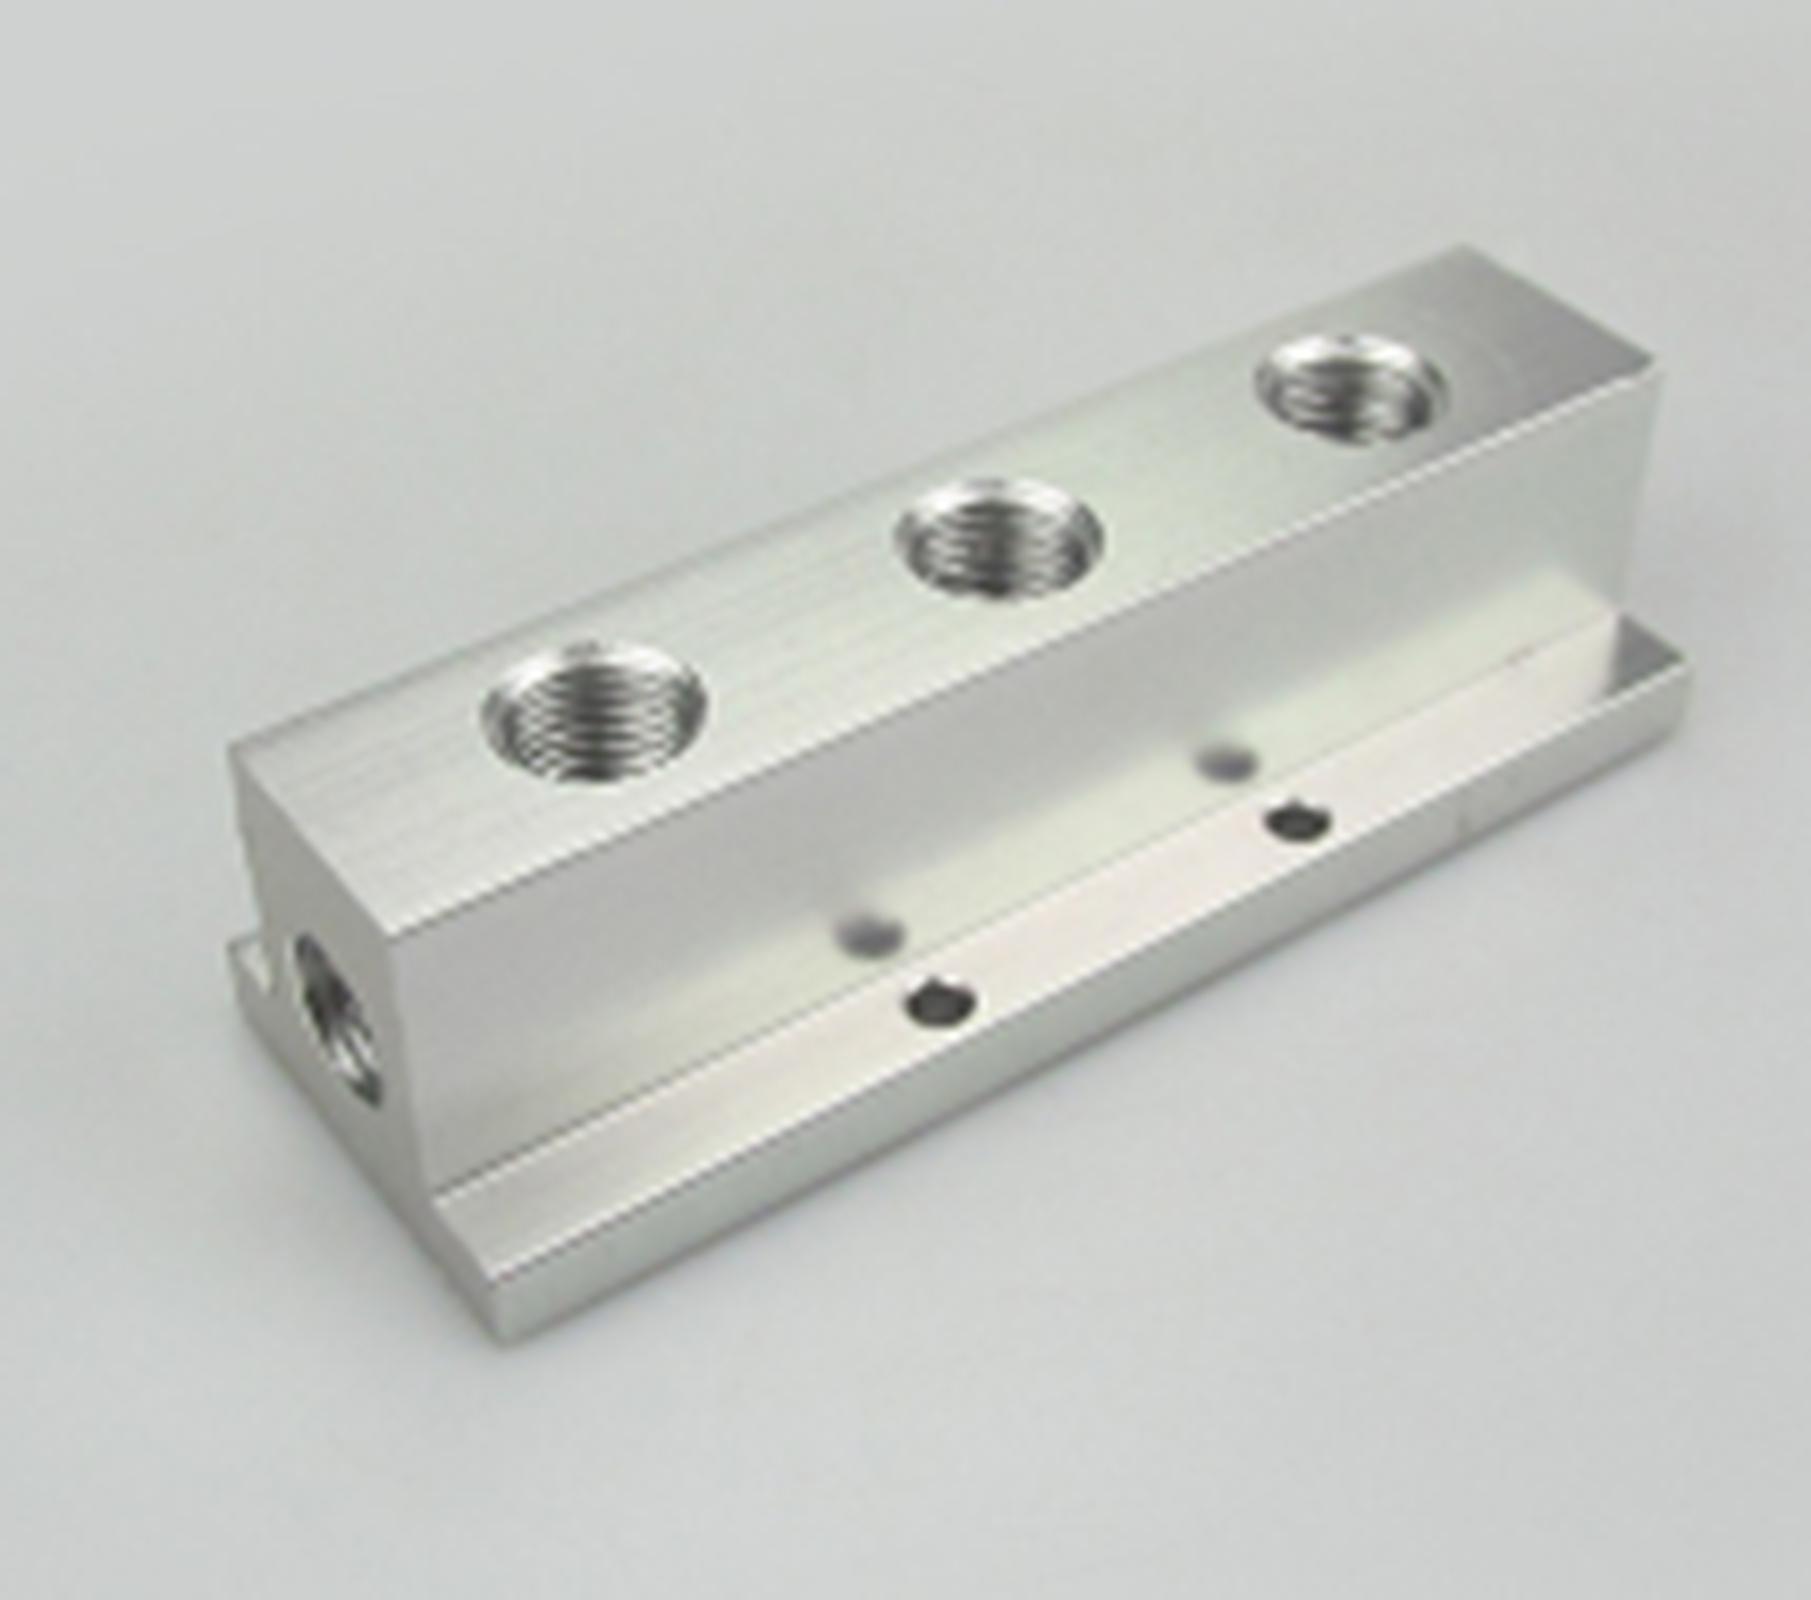 1/4 BSP Female 3 Way Solid Aluminum T-Shape Air Manifold Block Splitter1/4 BSP Female 3 Way Solid Aluminum T-Shape Air Manifold Block Splitter